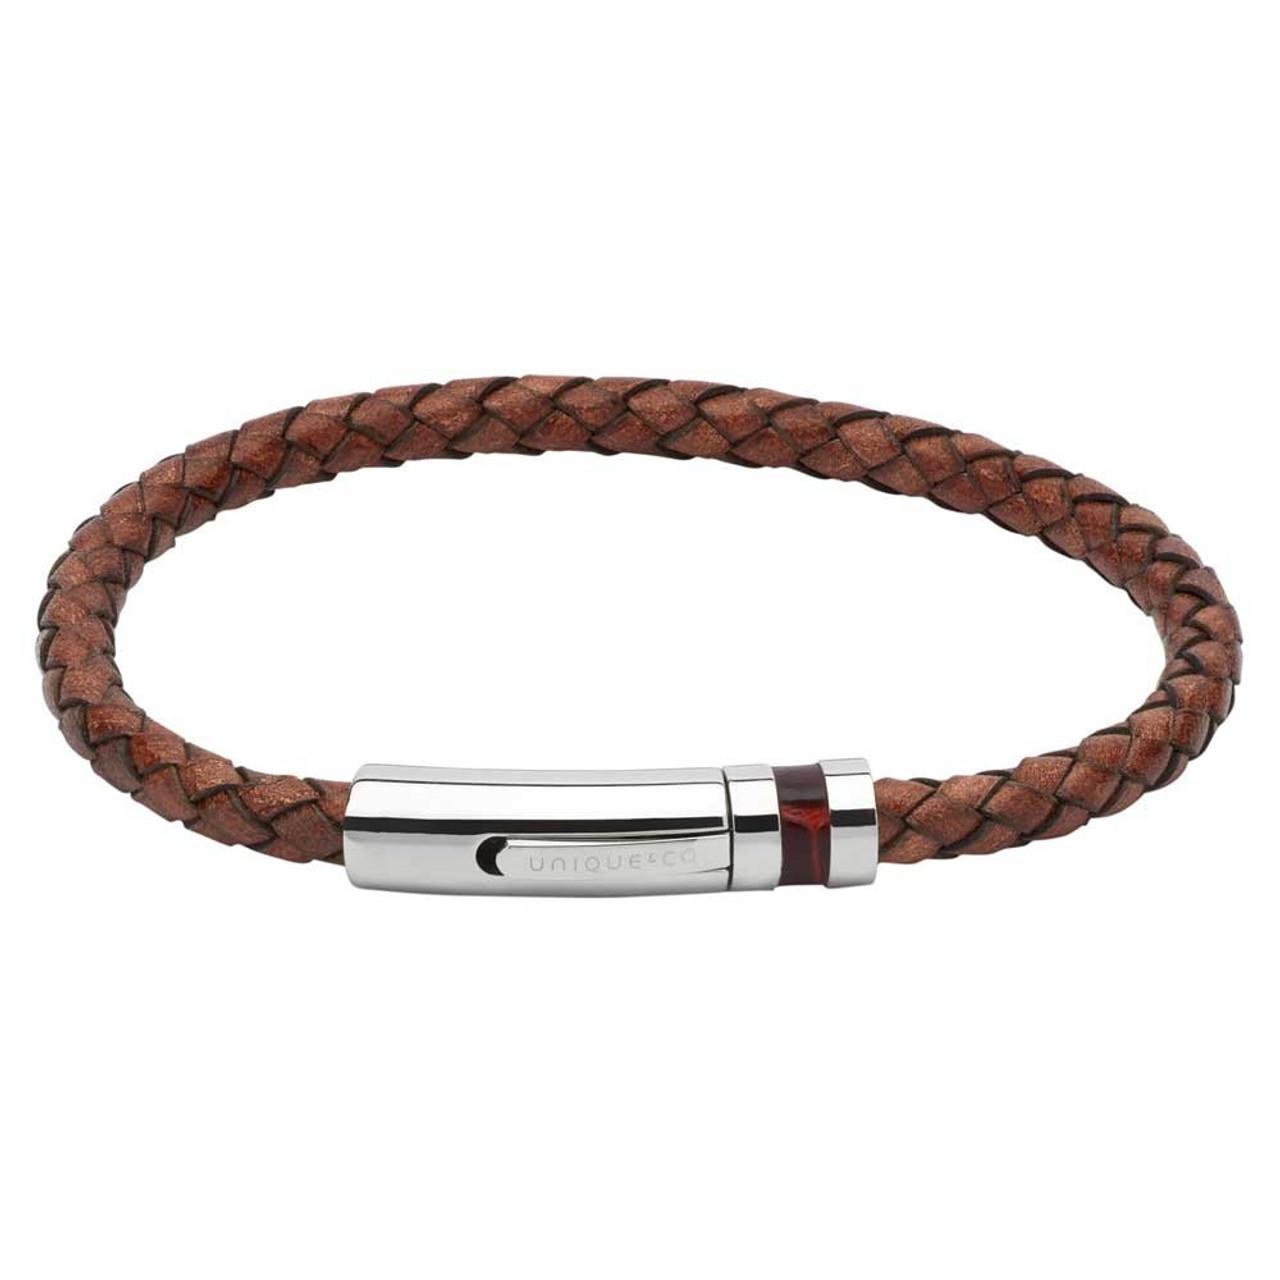 Unique /& Co Men/'s 21cm Black Leather Bracelet with Stainless Steel Clasp